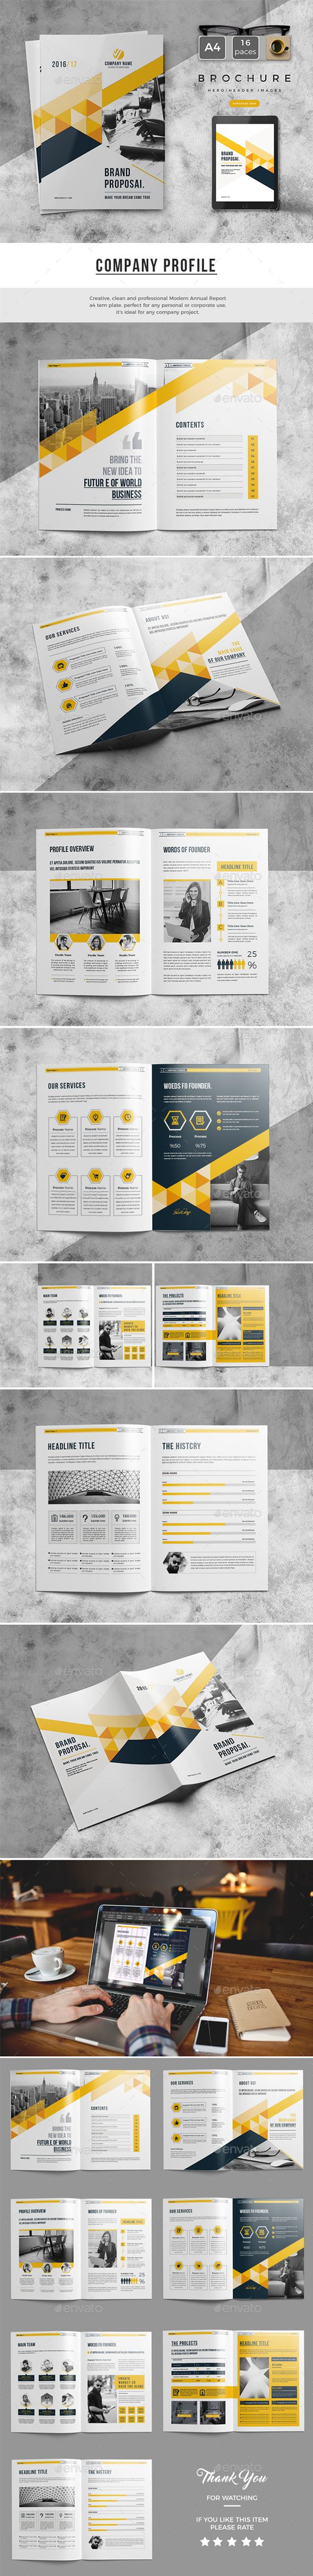 Proposal 2017 58 best Business Brochure images